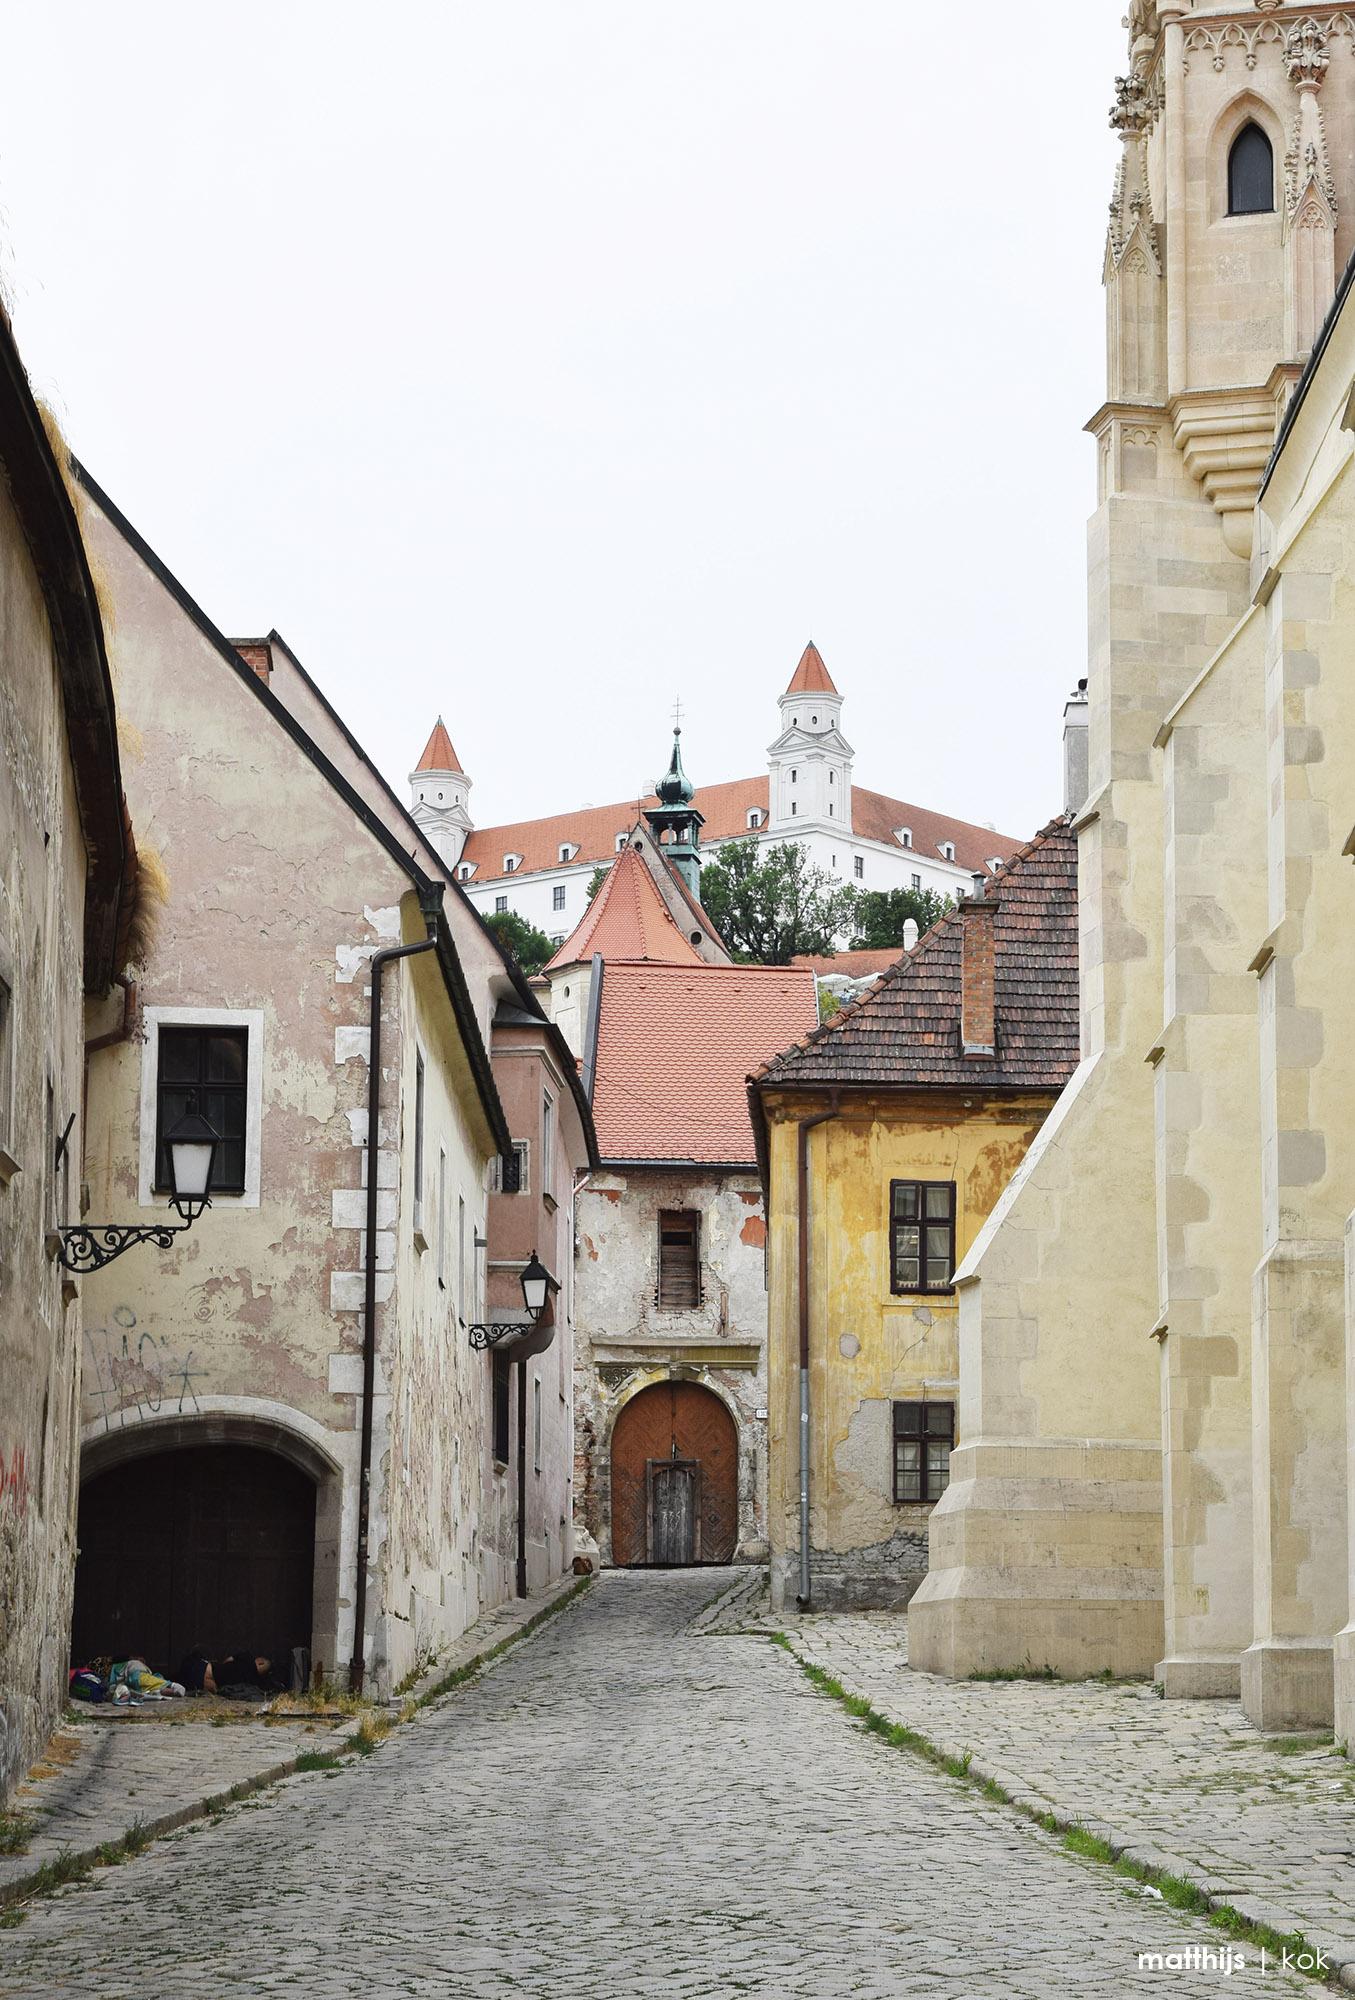 Farská Street, Bratislava, Slovakia | Photo by Matthijs Kok